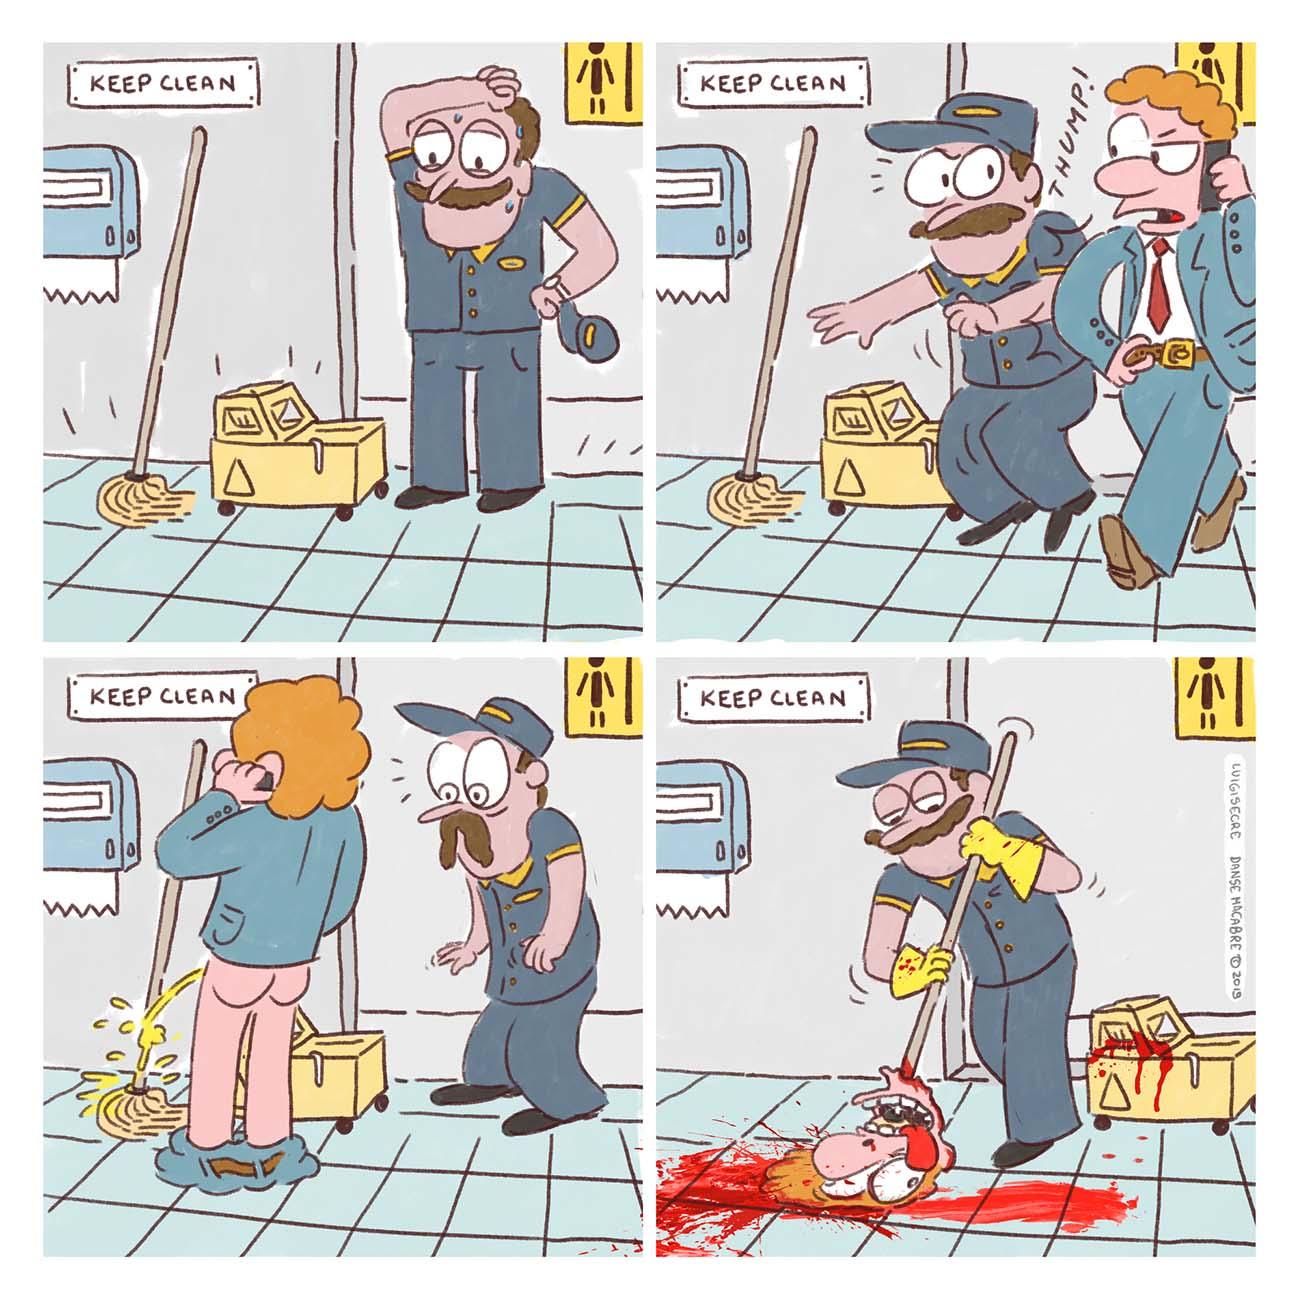 Contenuti_Low_Res_Luigi_Segre_Cartoons_2019_Danse_Macabre_19.jpg